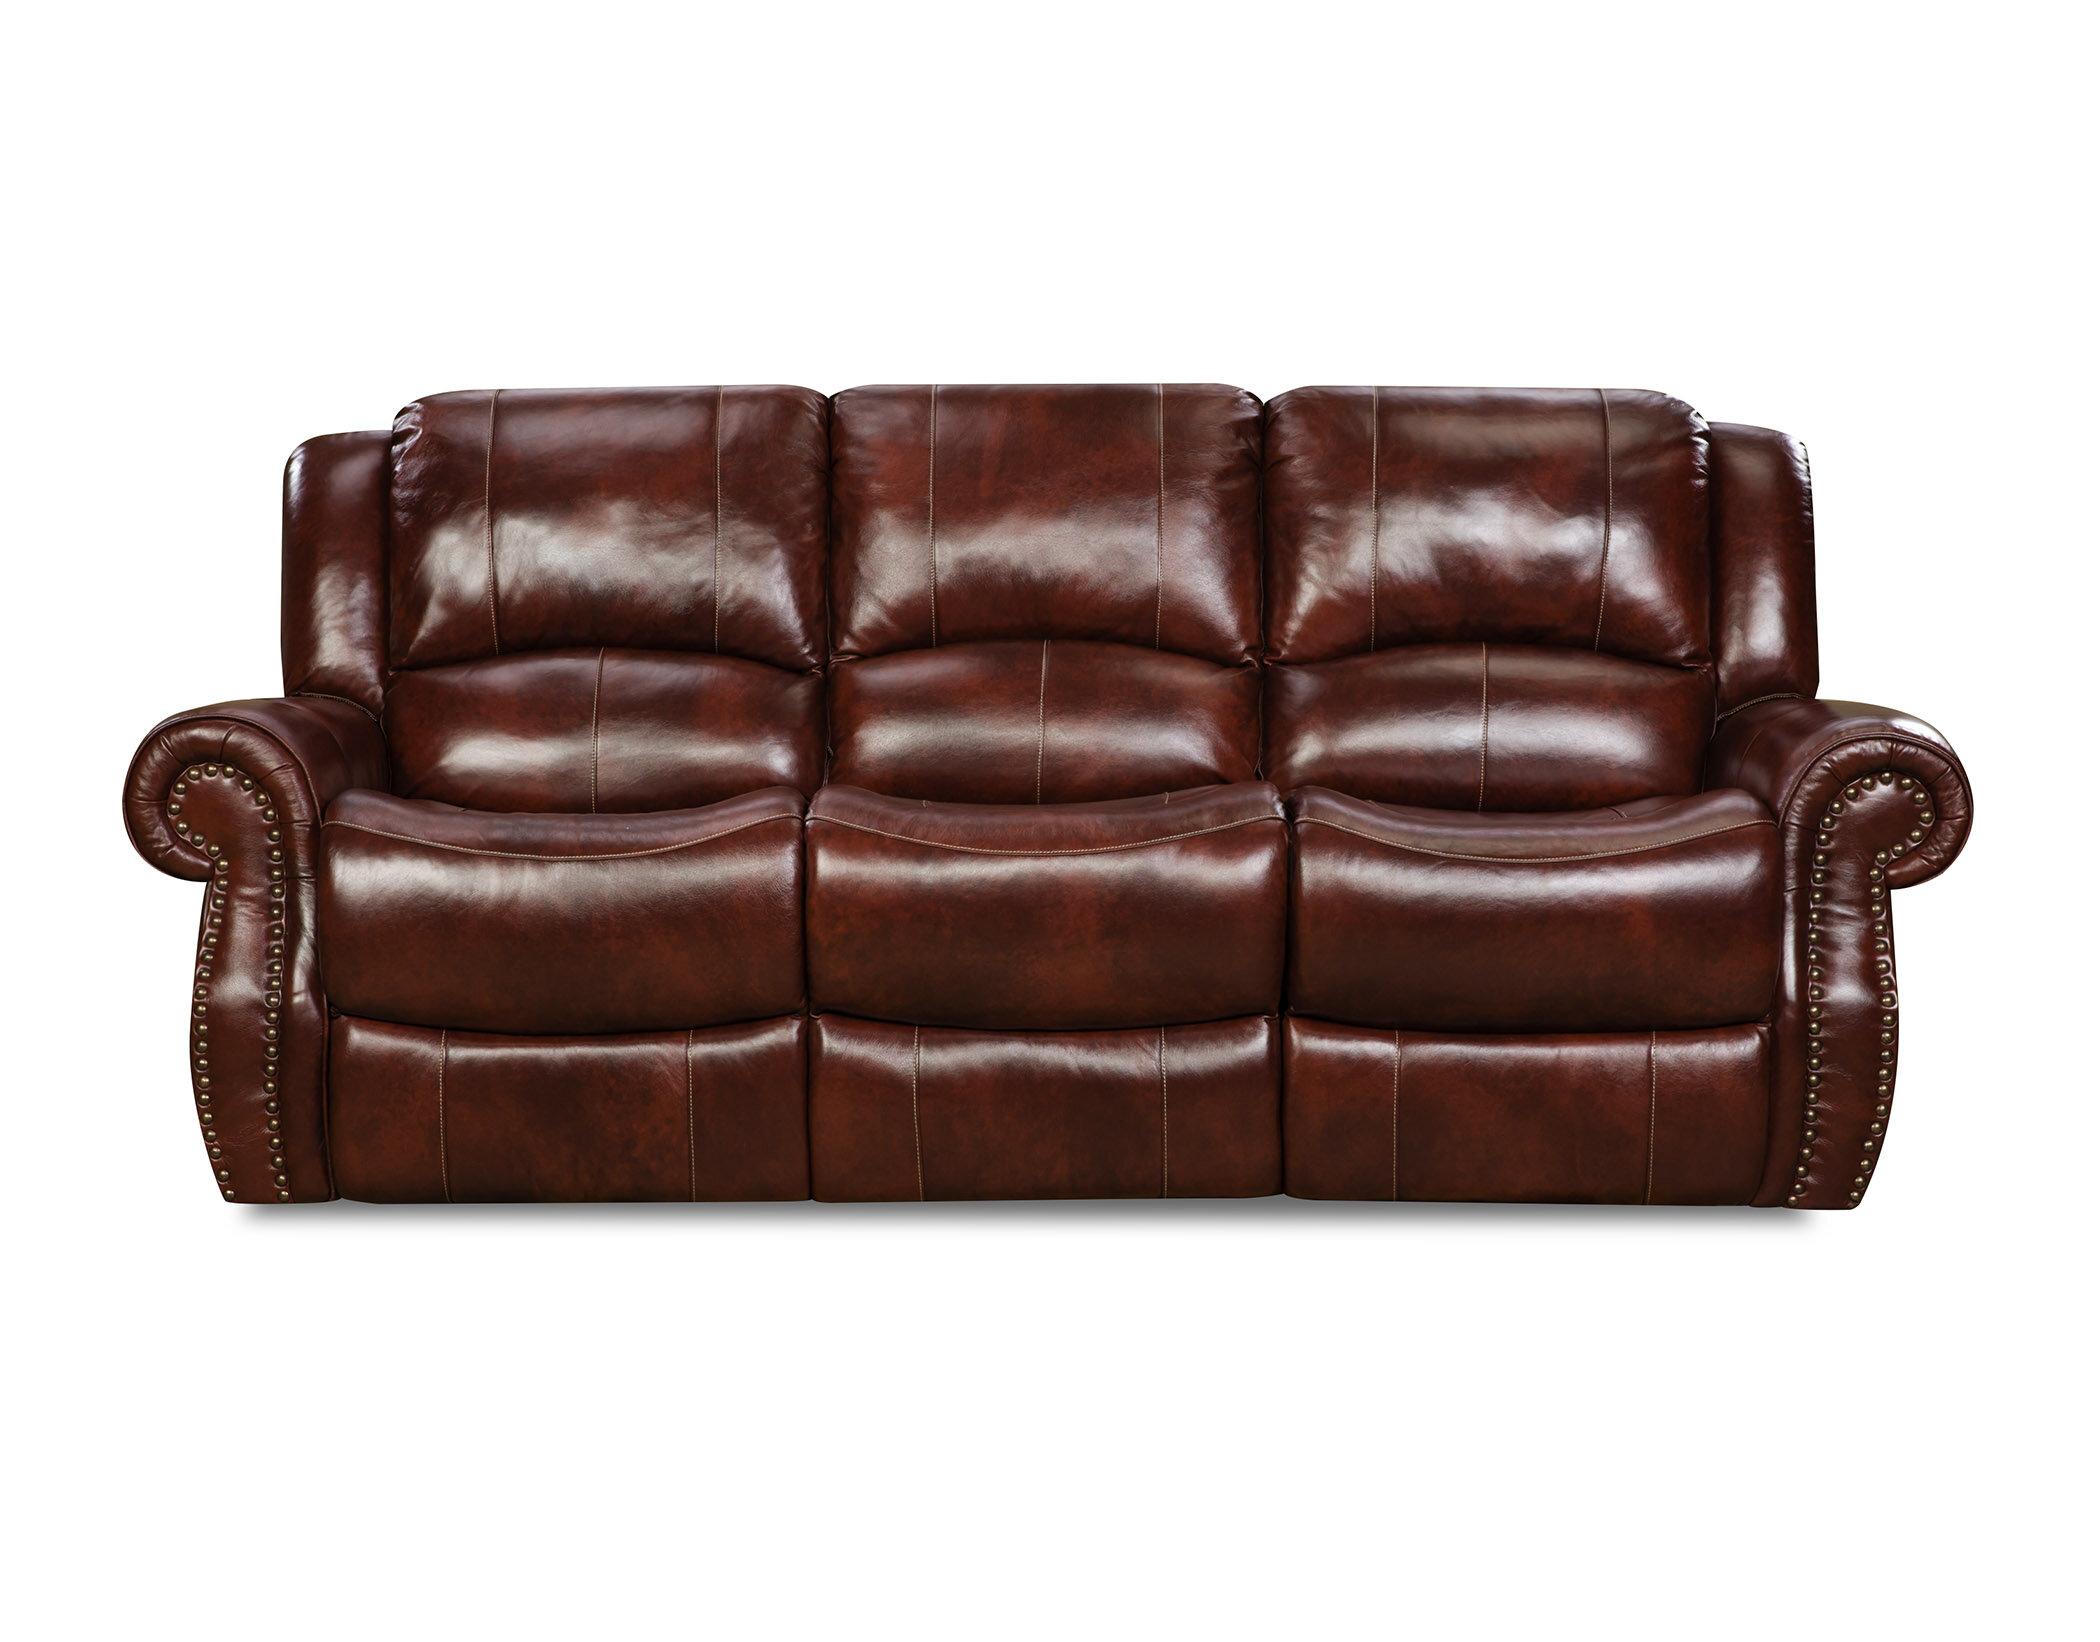 Alcott Hill Hein Leather Reclining Sofa Wayfair